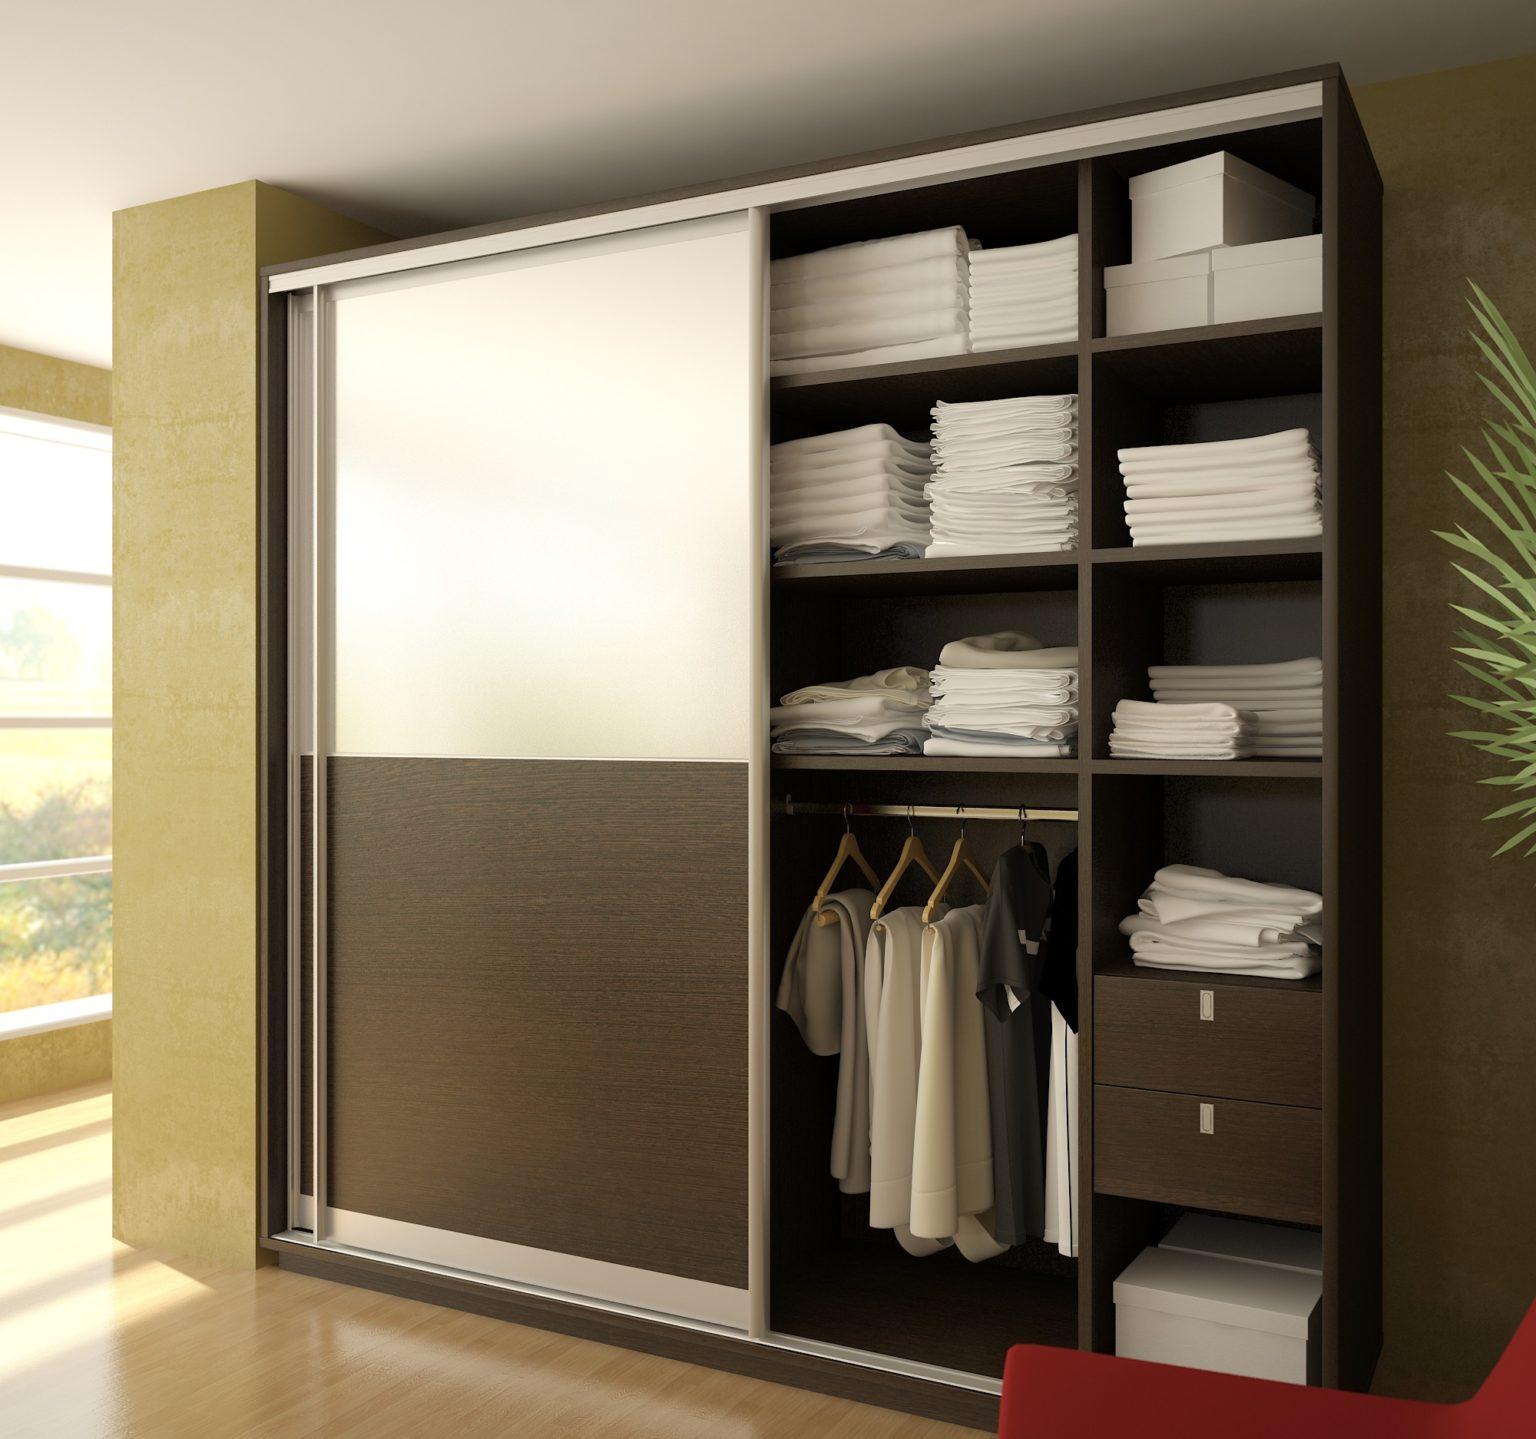 наполнение шкафа купе идеи дизайн